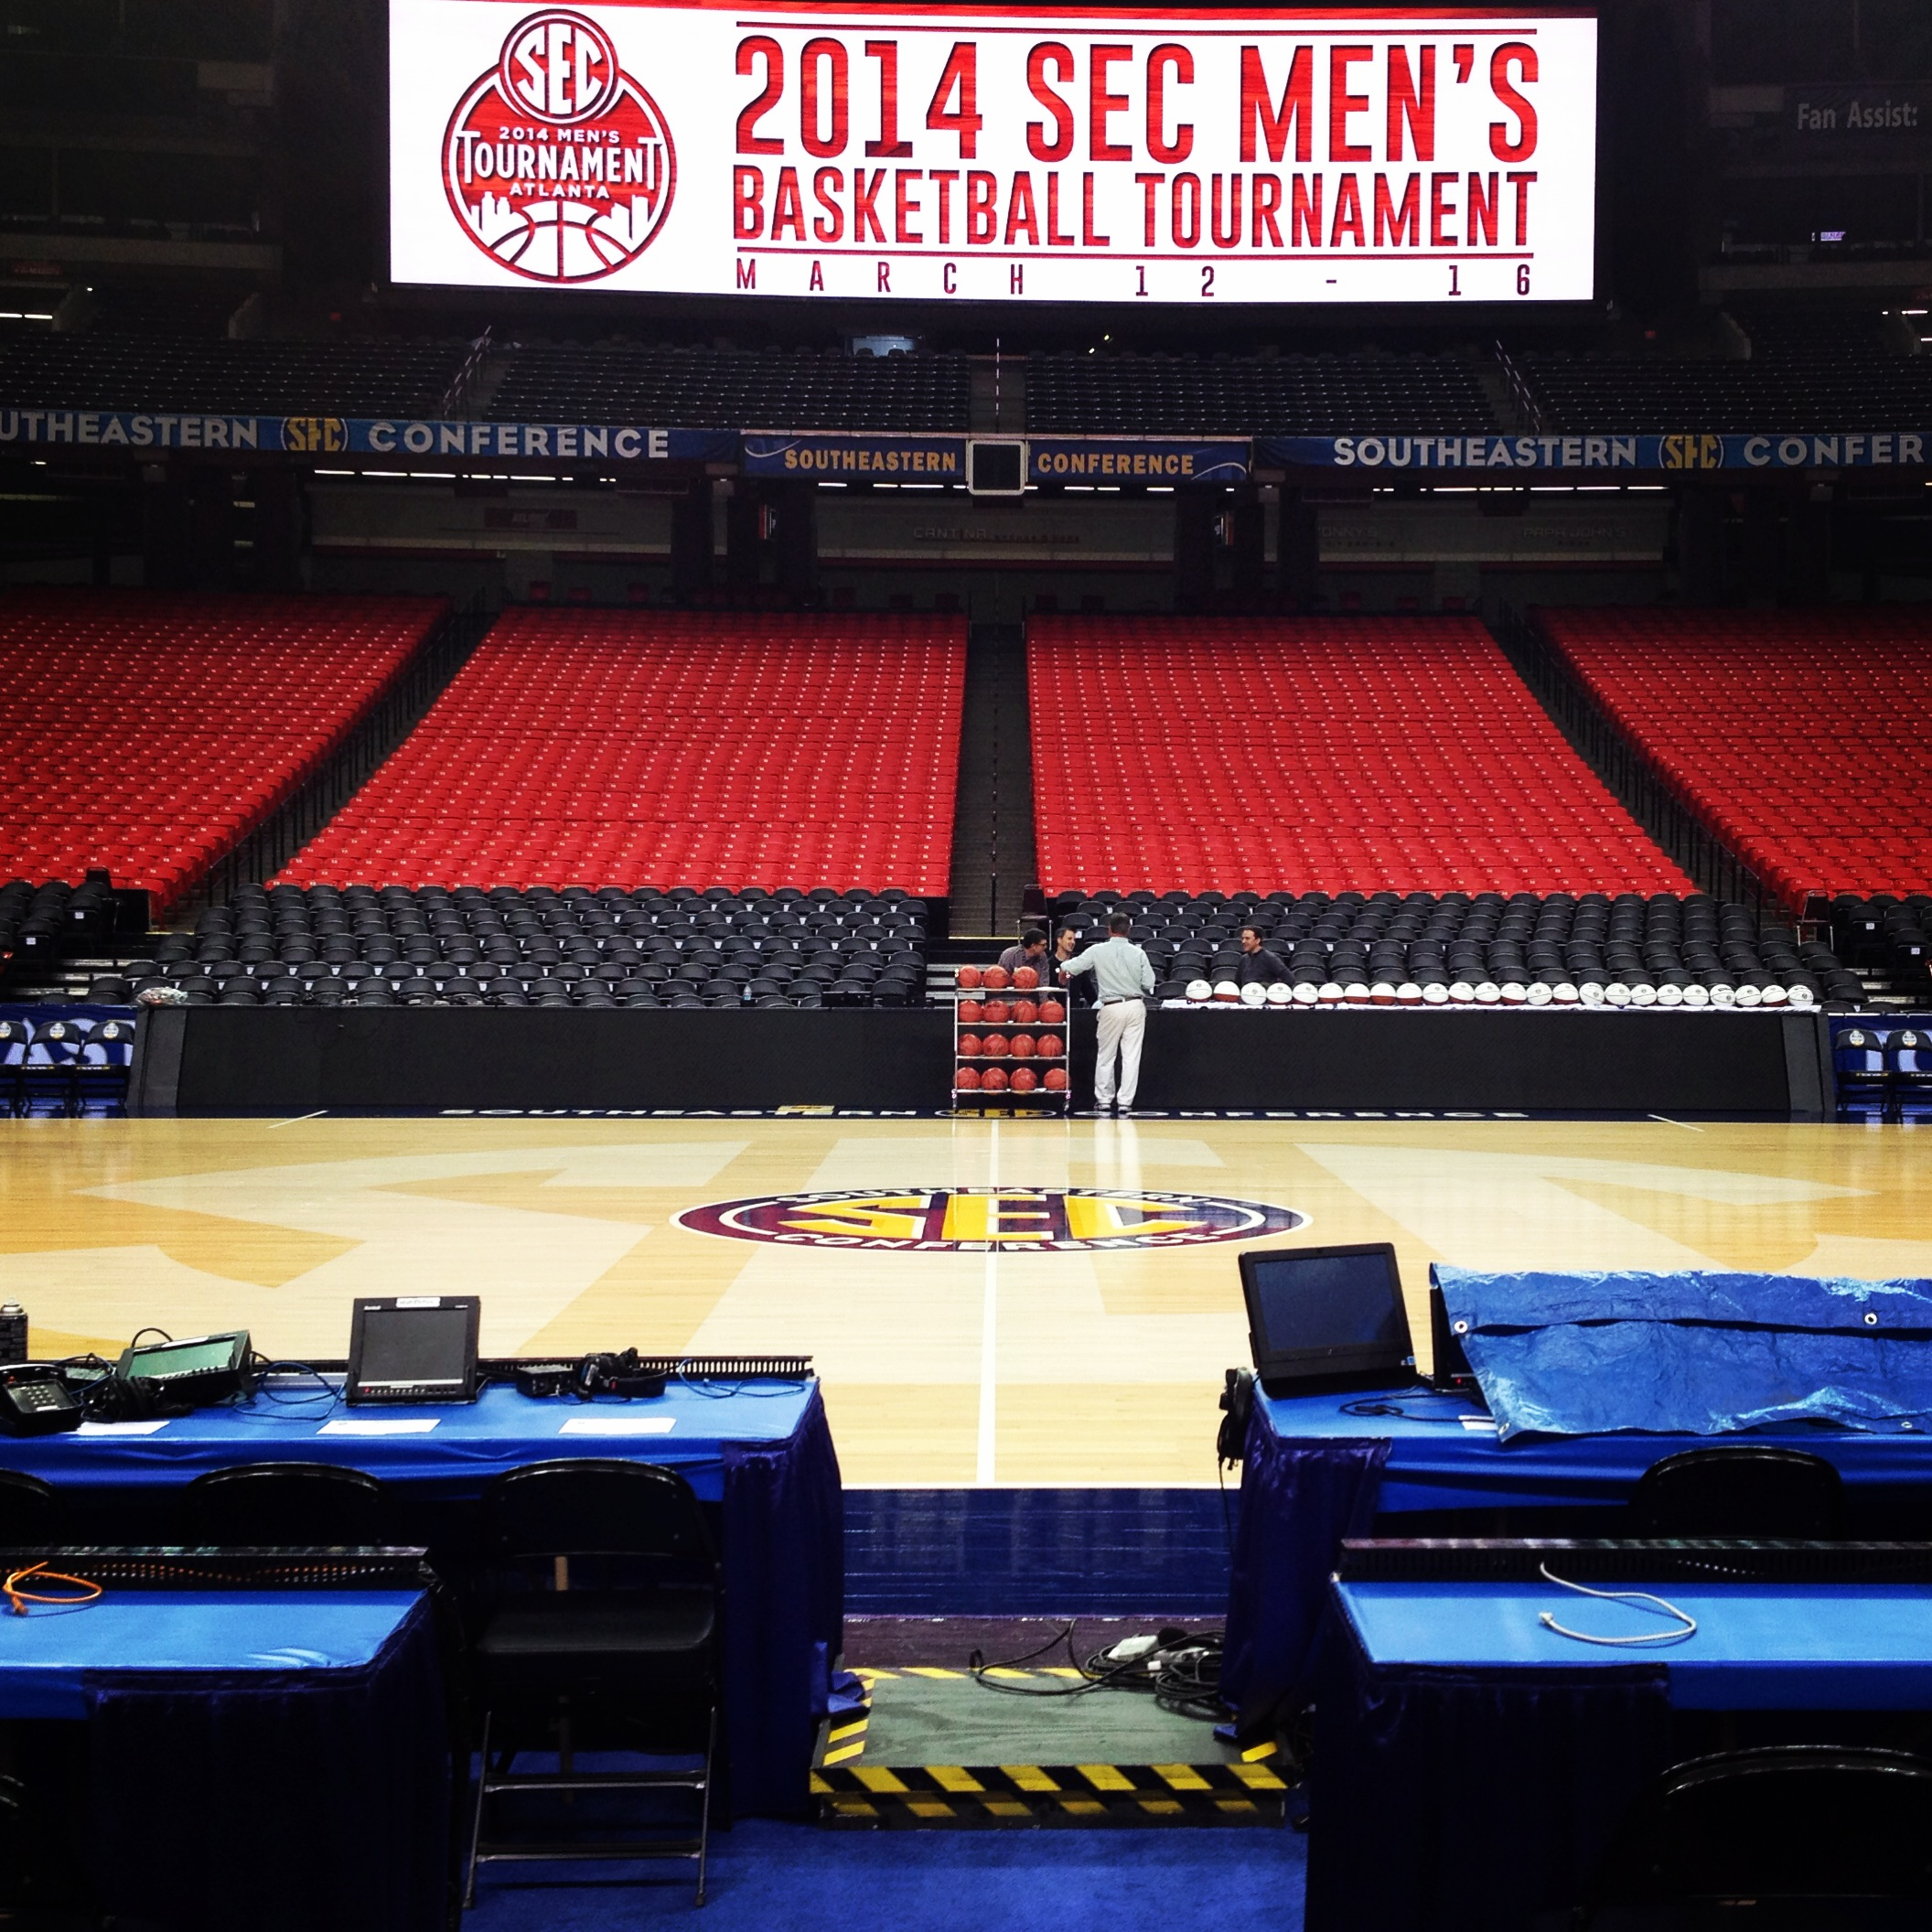 2014 SEC Men's Basketball Tournament